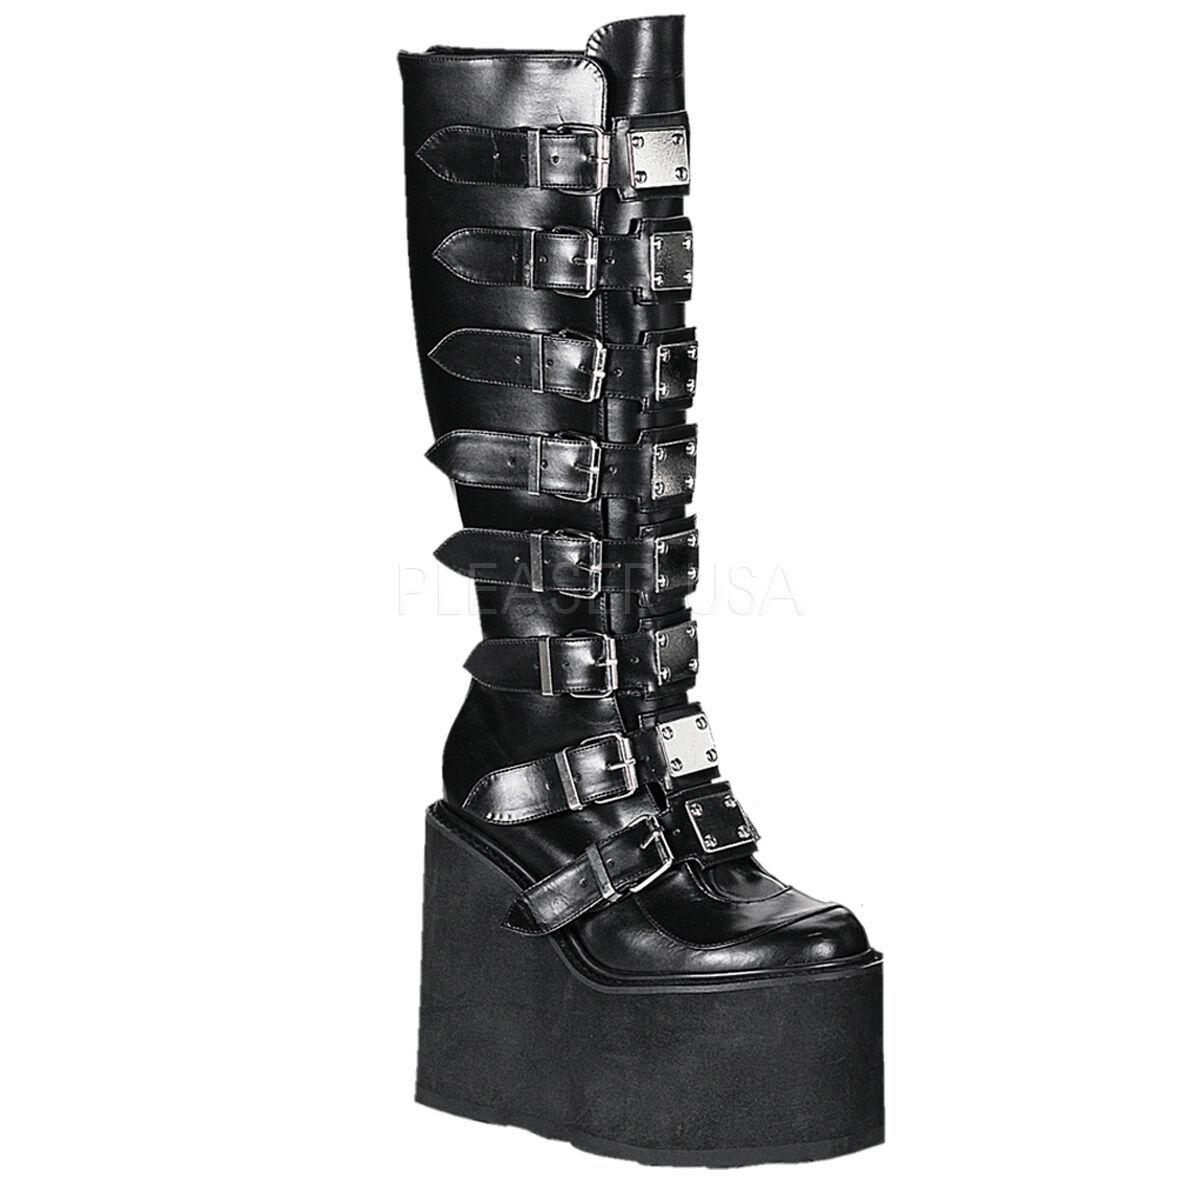 Demonia 5.5  Platform Matte Black Gothic Swing-815 Knee Boots 6 7 8 9 10 11 12